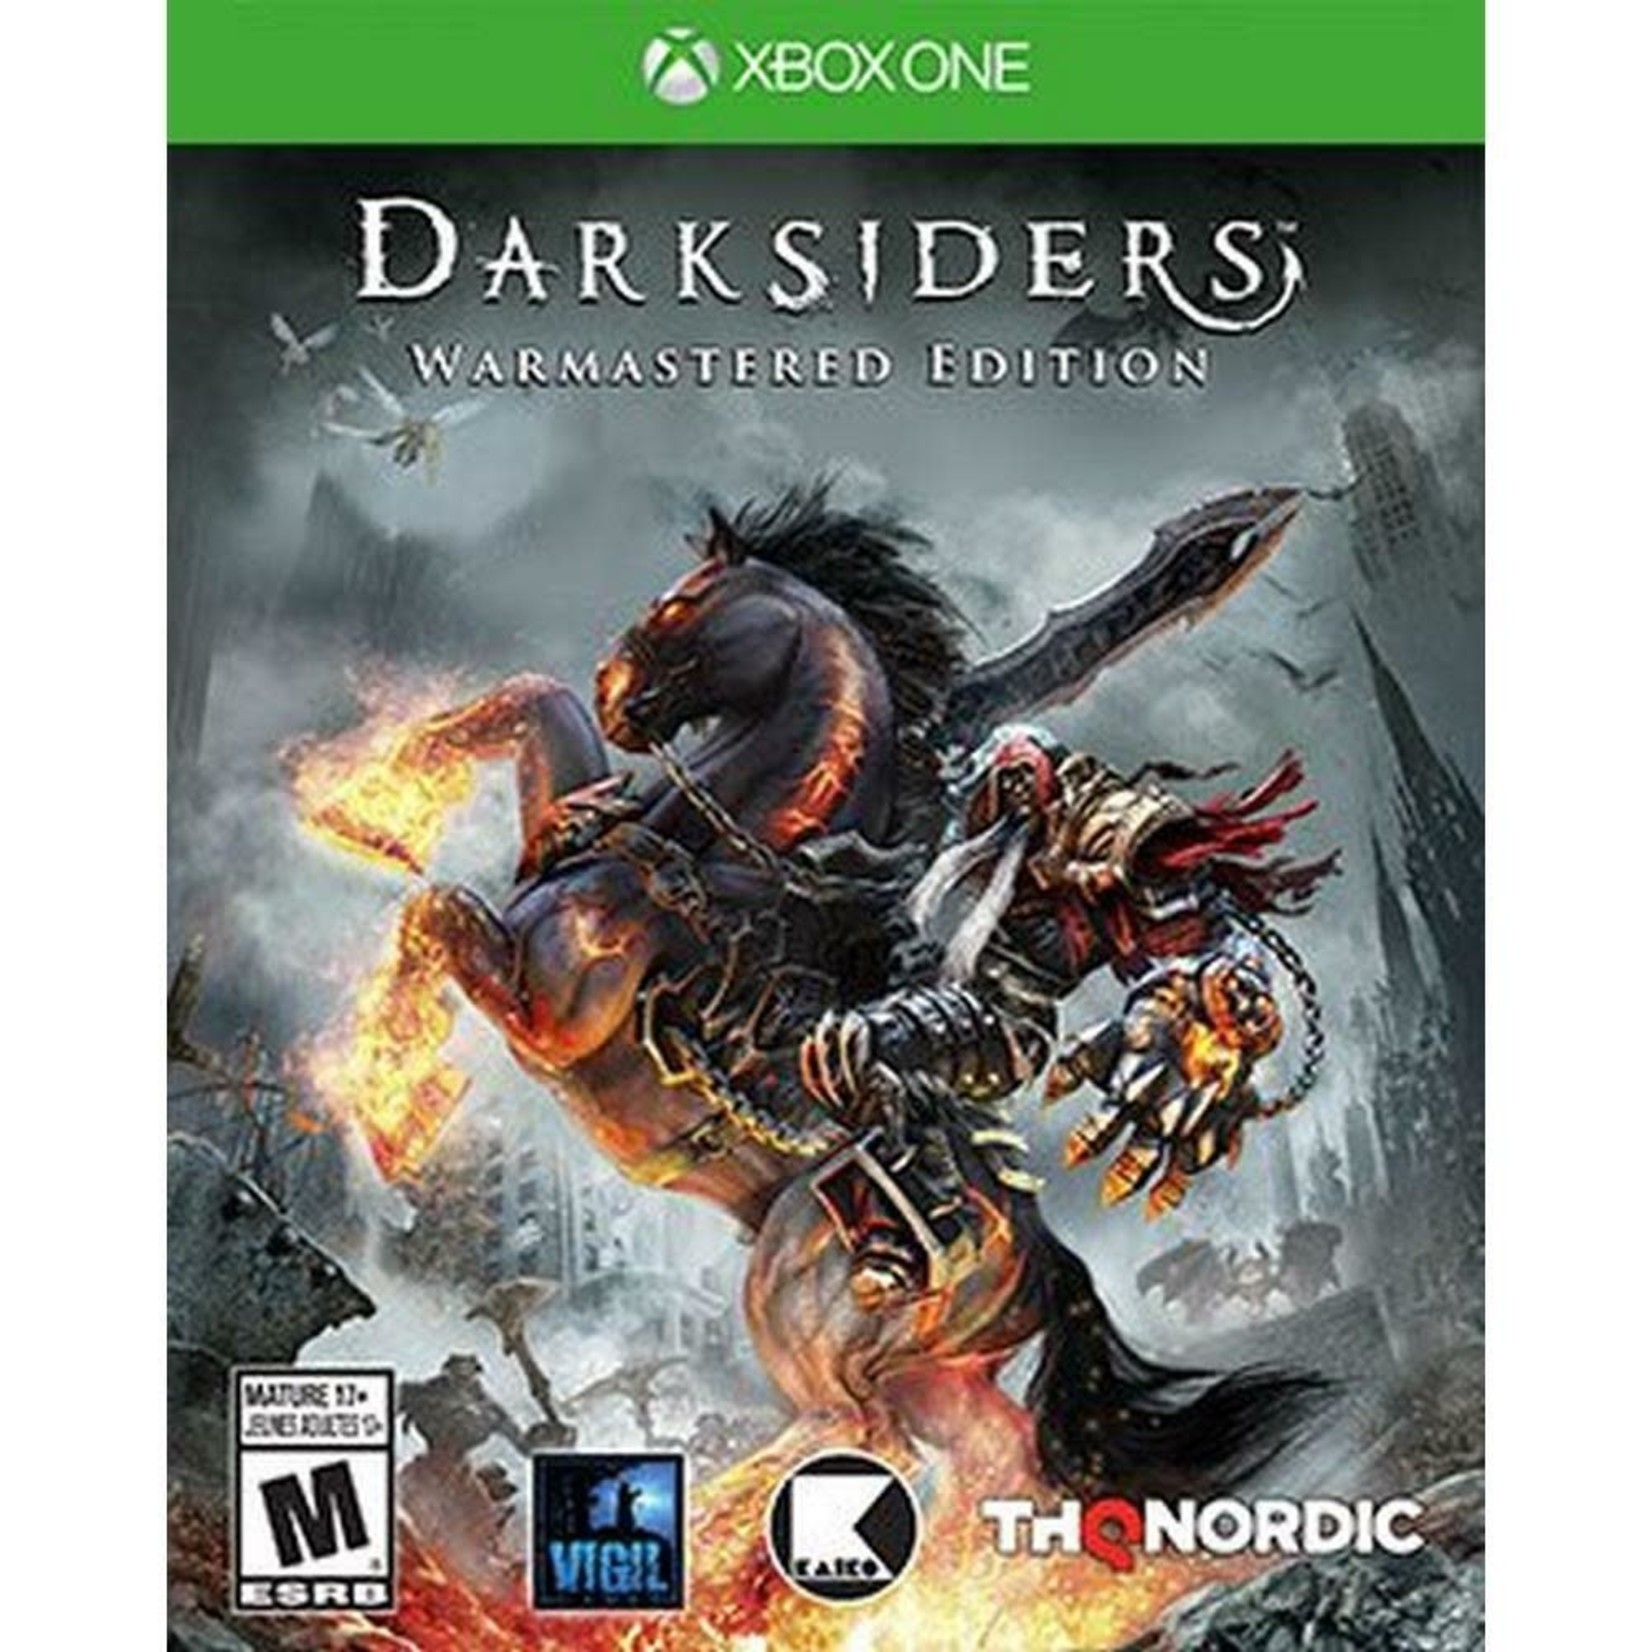 XB1U-Darksiders Warmastered Edition